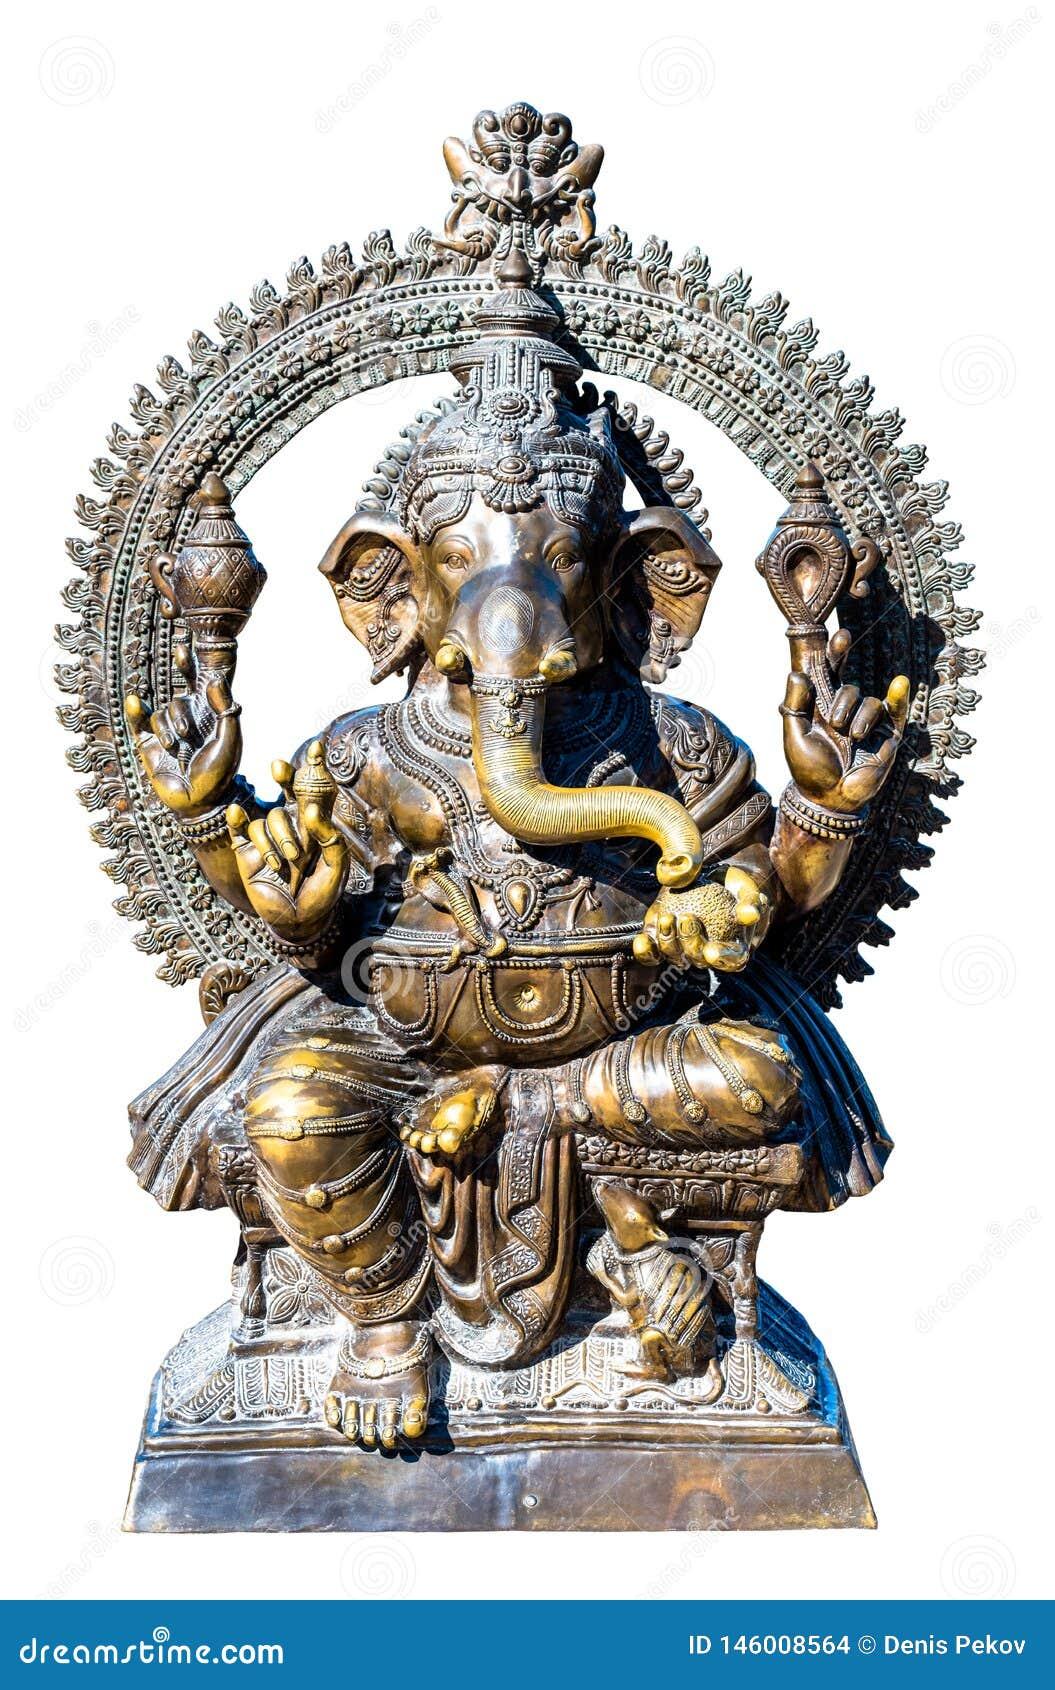 Bronzeskulptur Gott Ganesh